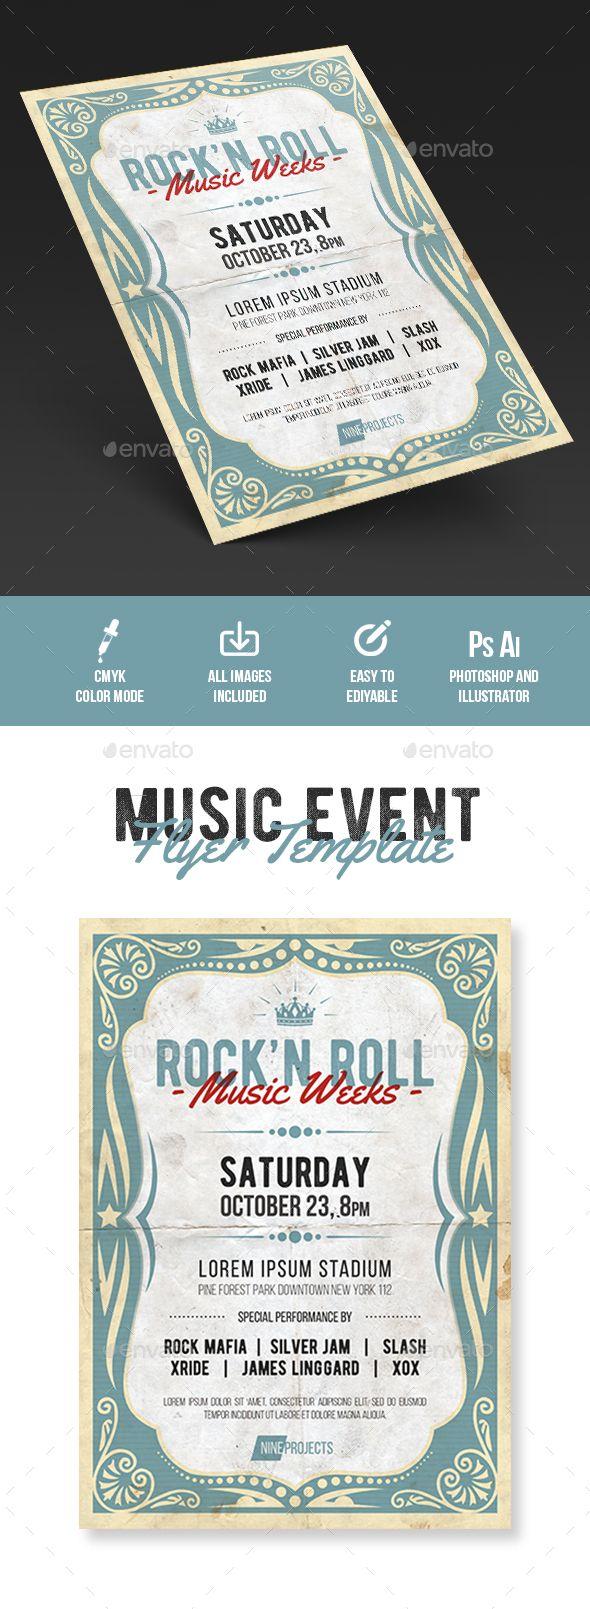 Music Flyer Template PSD, AI Illustrator